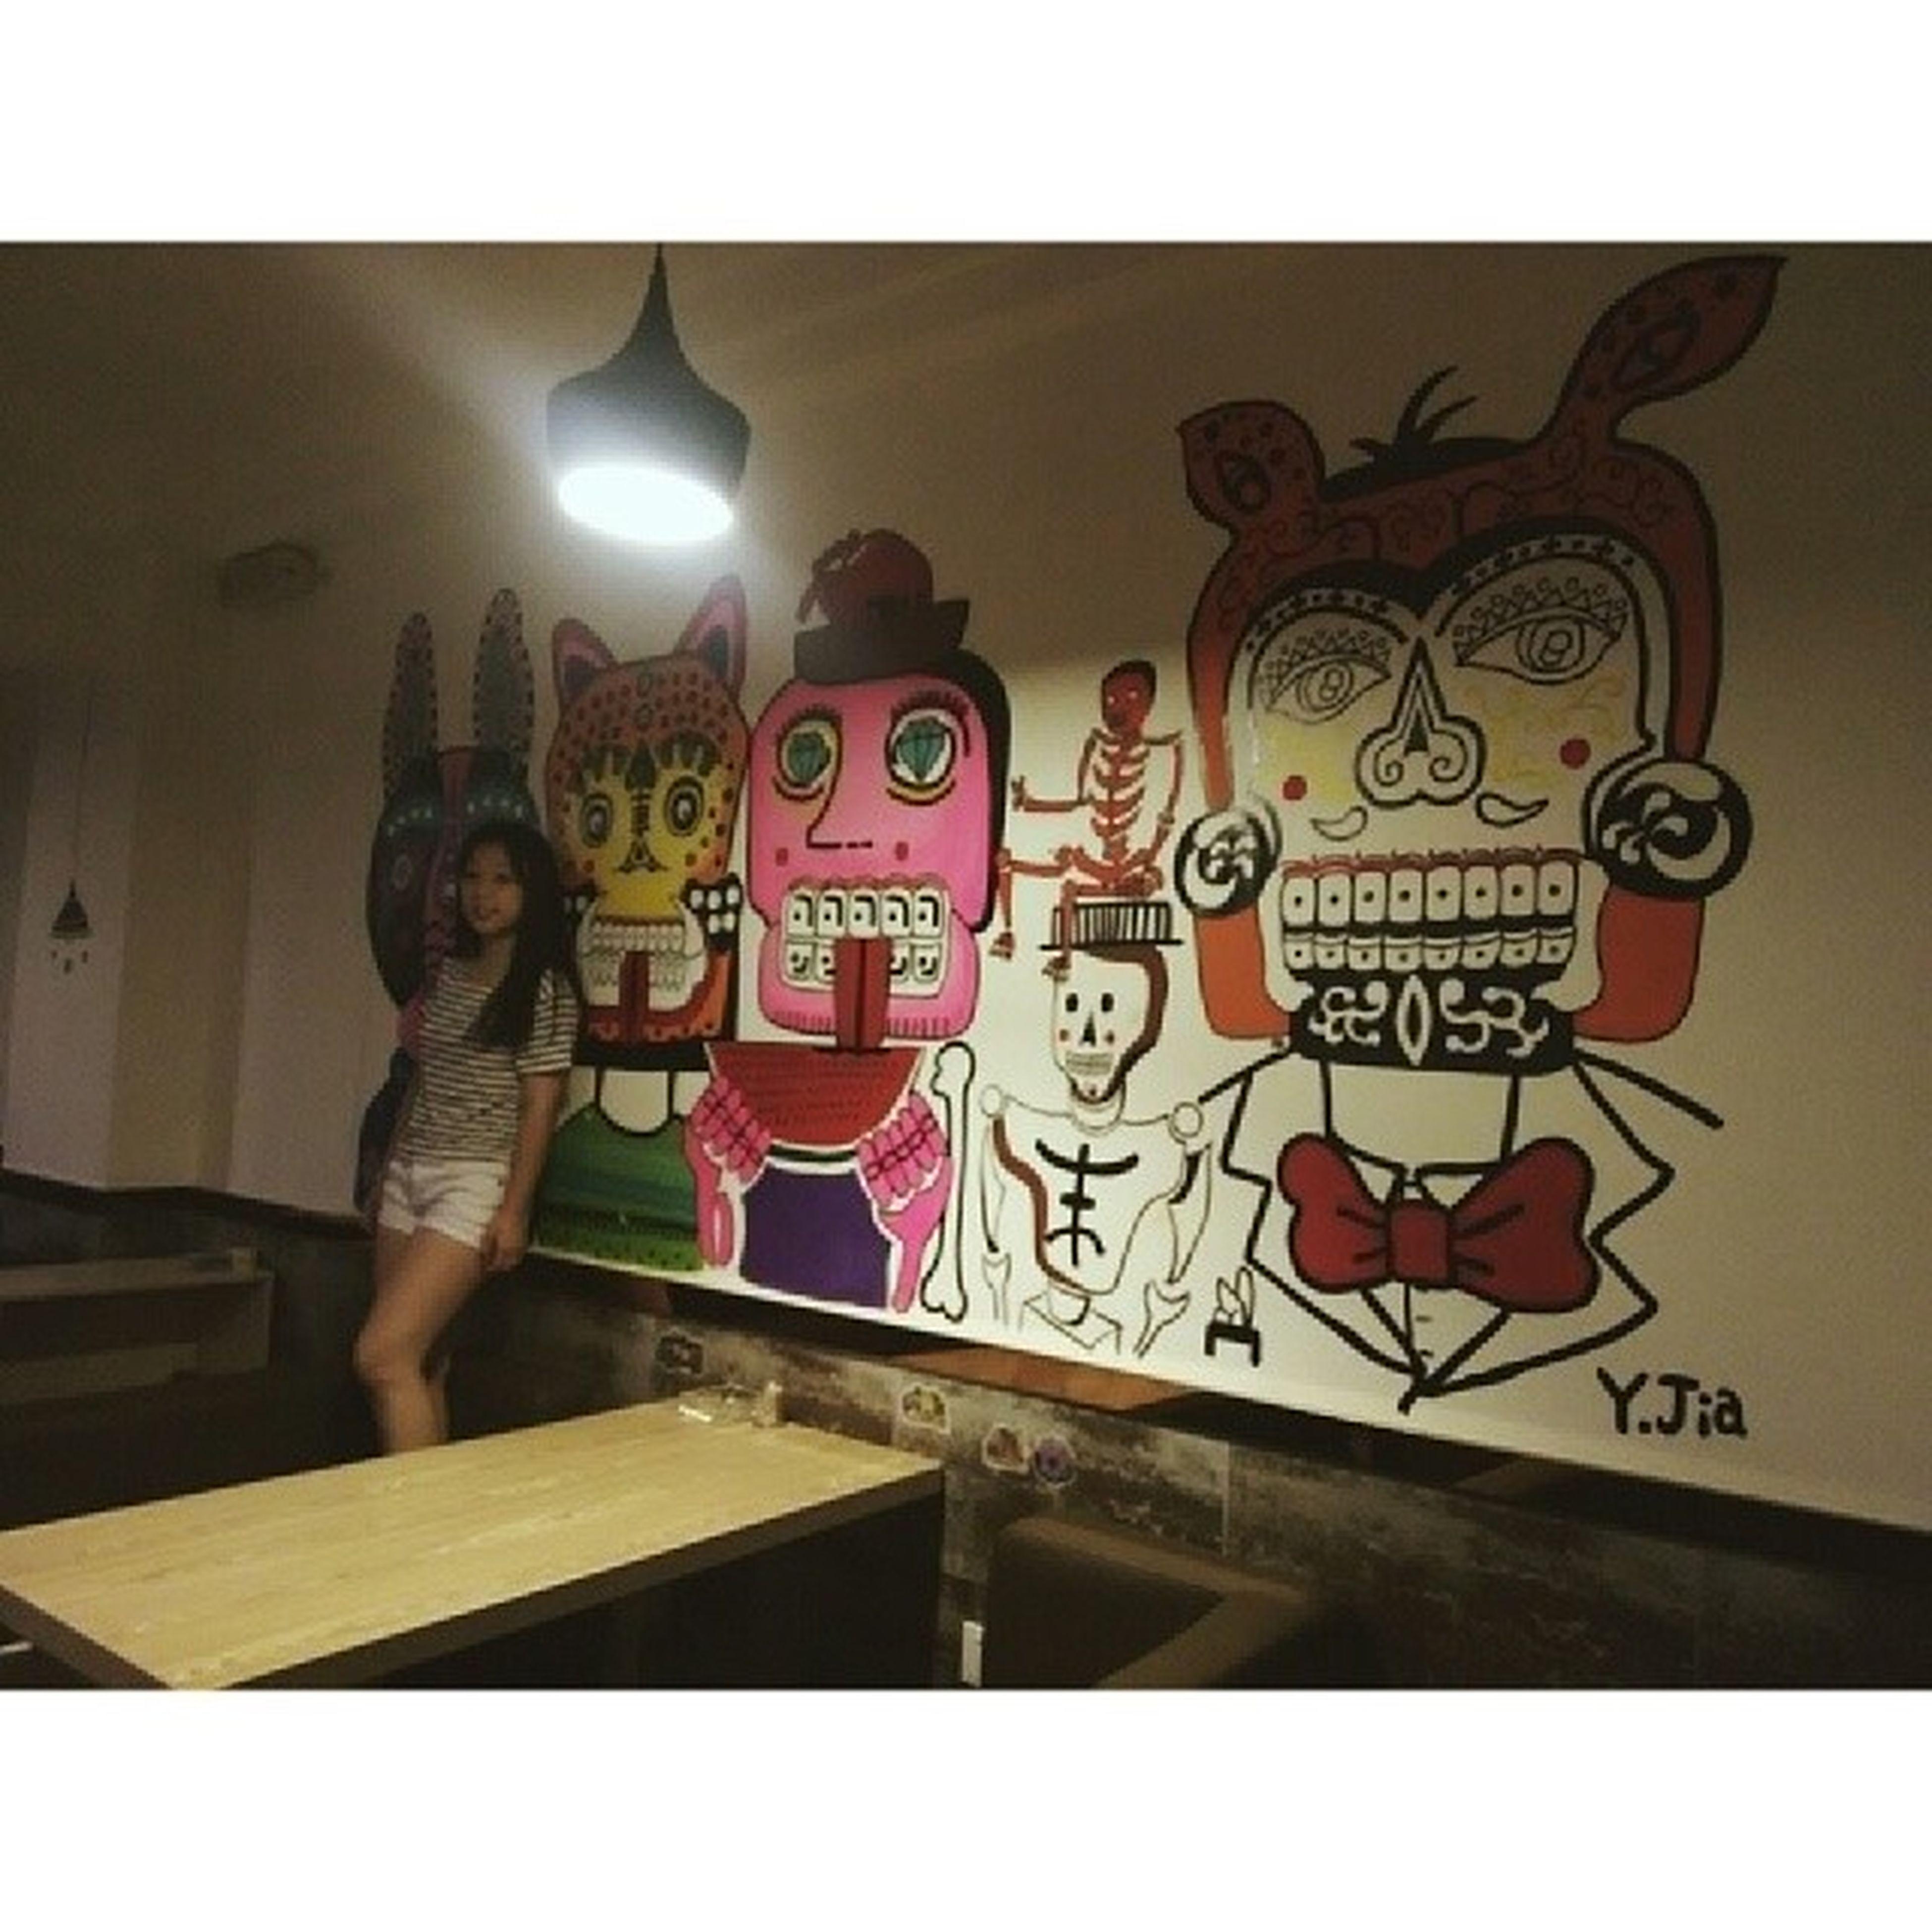 transfer print, auto post production filter, indoors, art, creativity, art and craft, human representation, wall - building feature, lifestyles, built structure, leisure activity, architecture, graffiti, illuminated, communication, animal representation